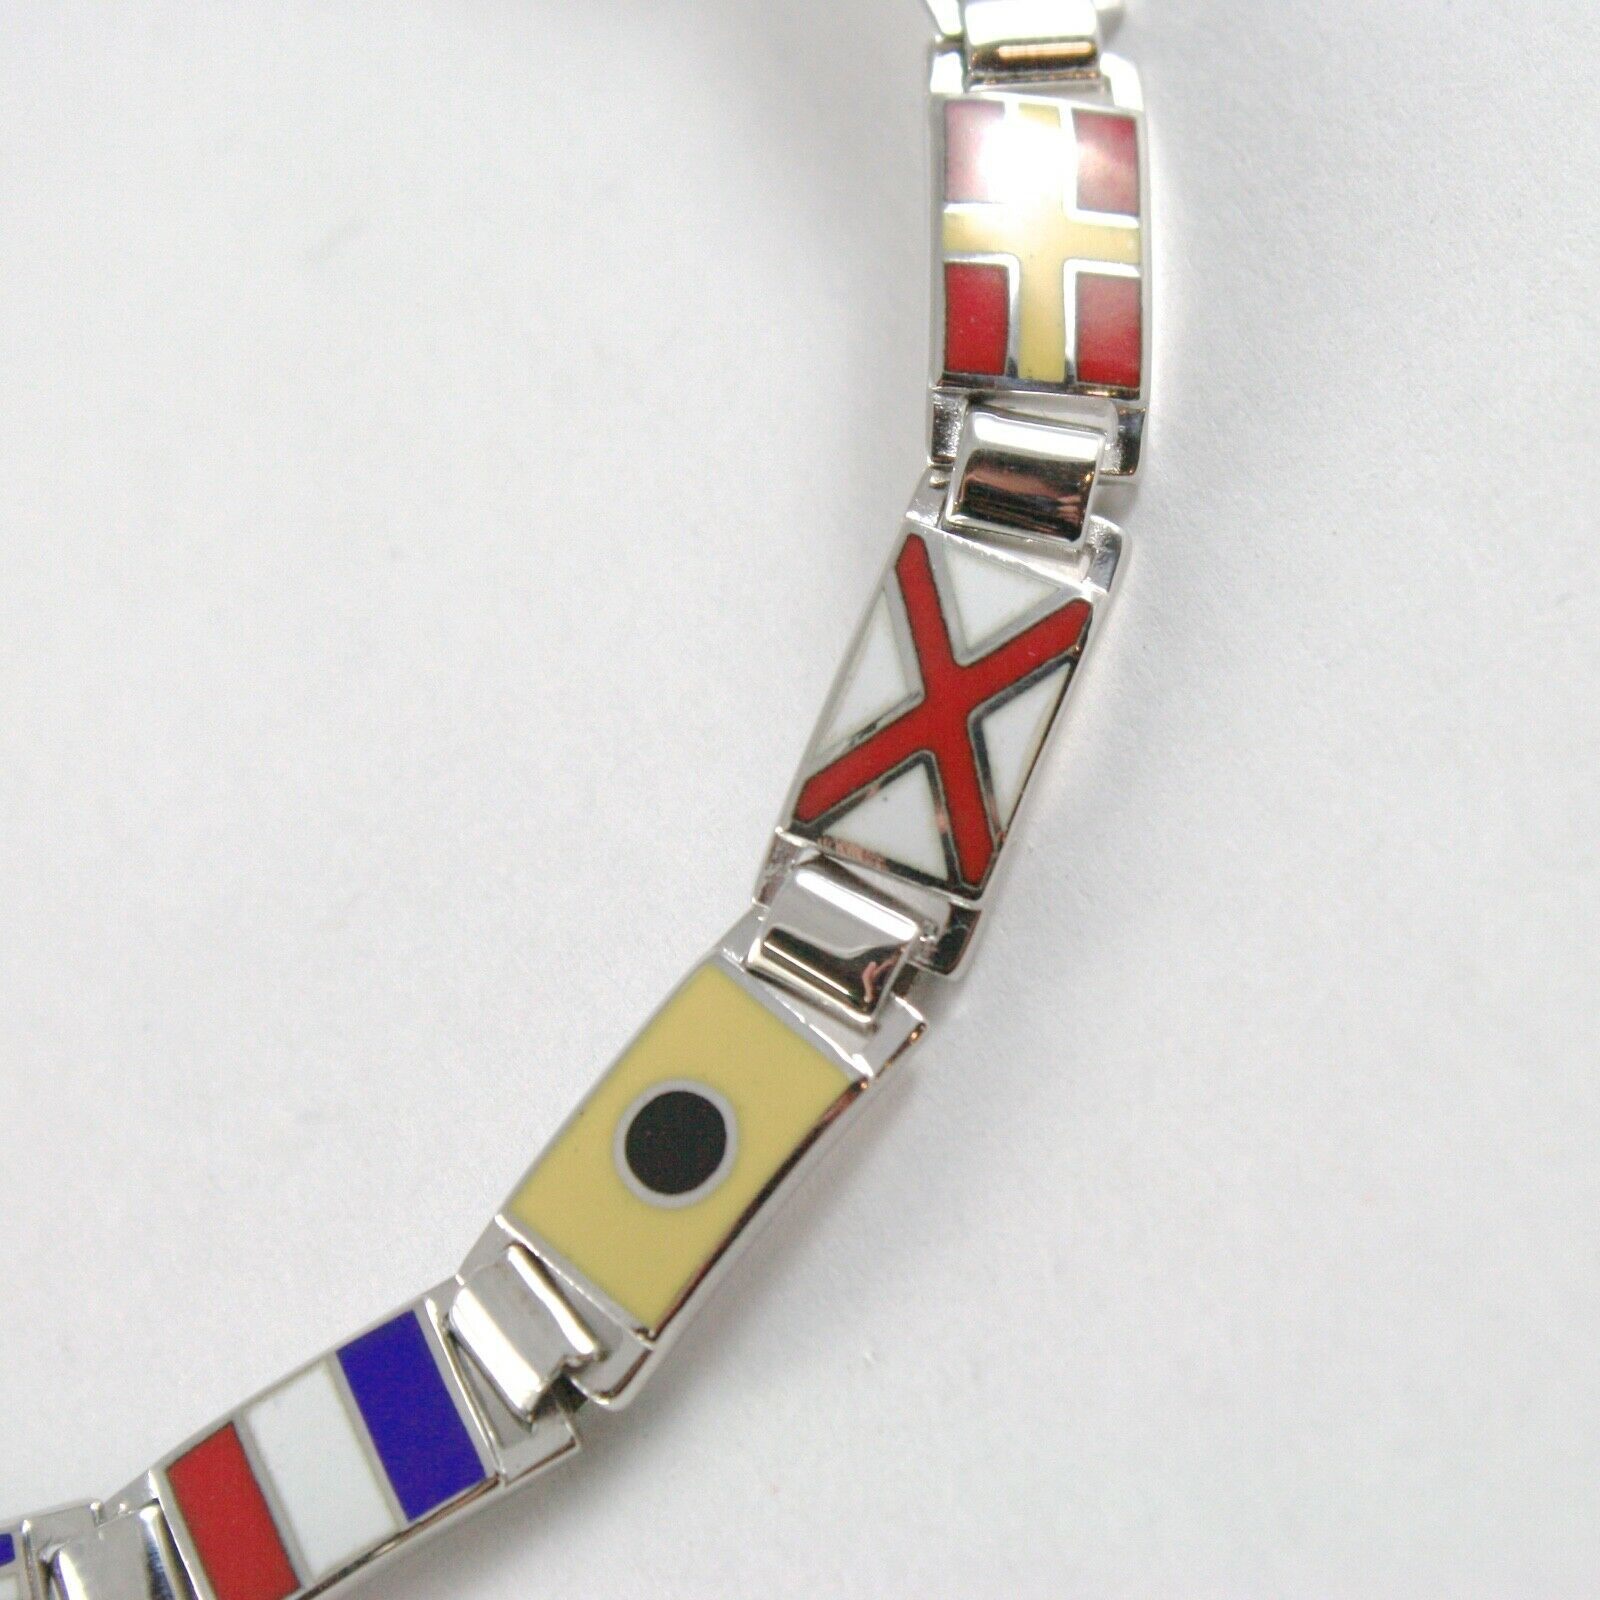 Armband Silber 925, Flags Seekarten Glasierte Fliesen, Lang 18 cm, Dicke 6 MM